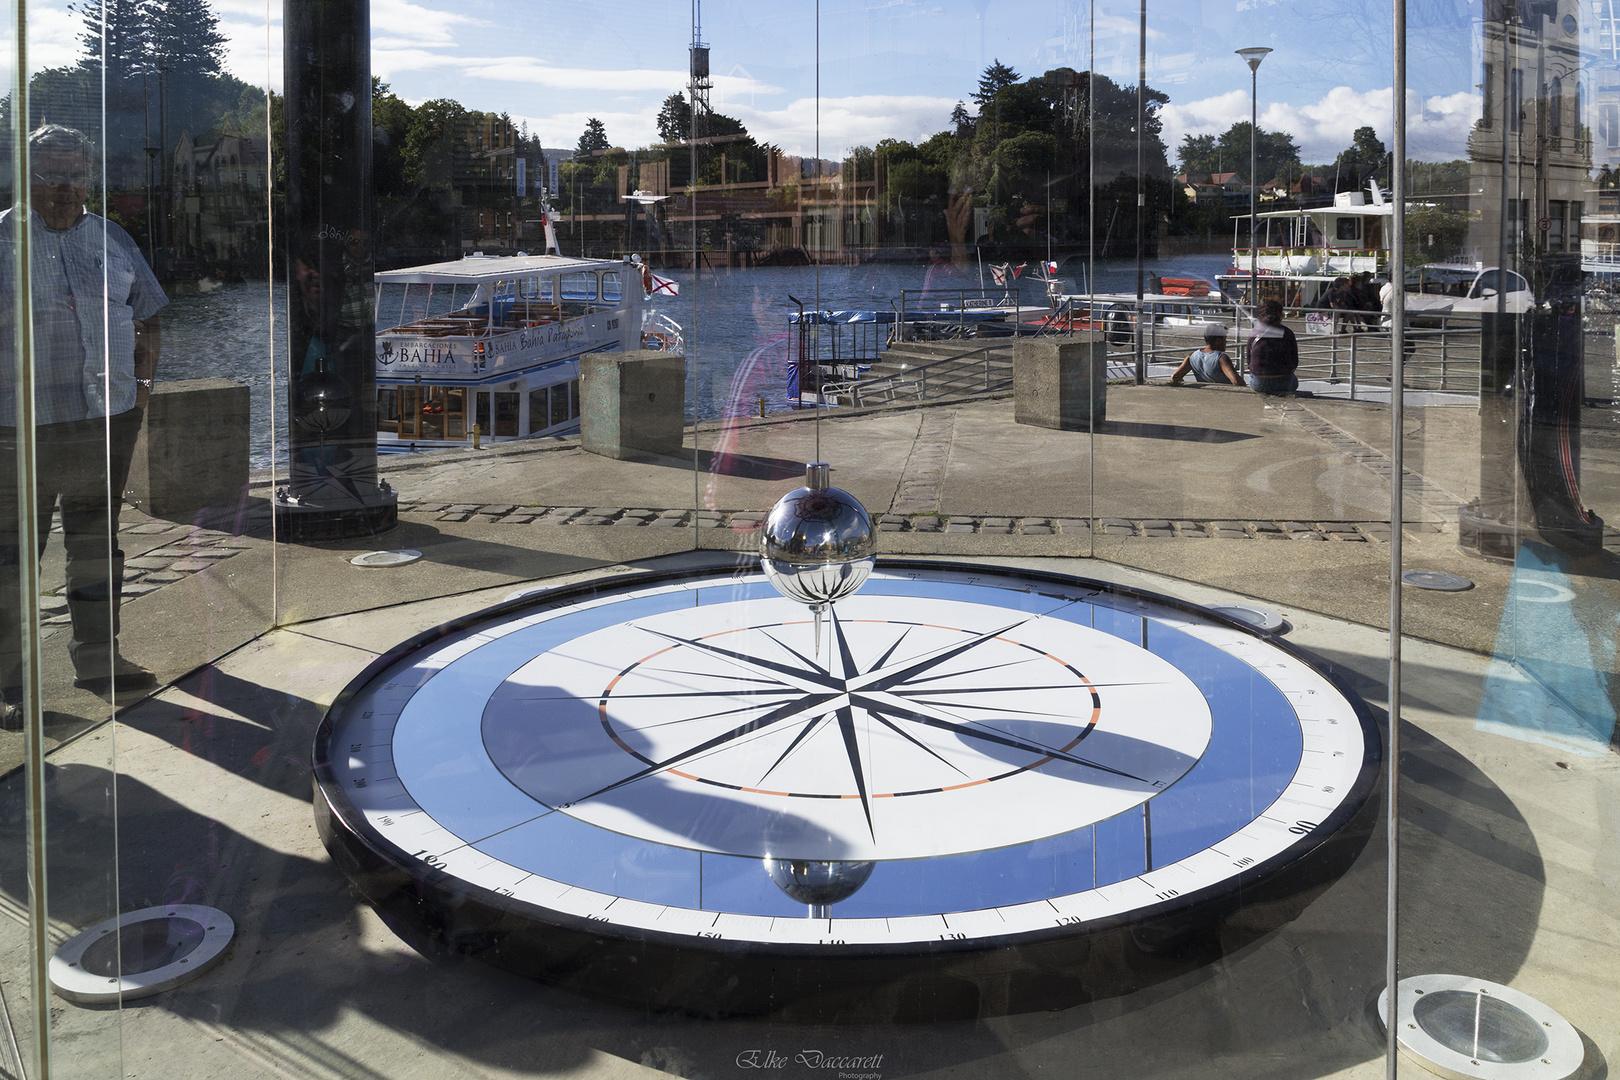 Foucaultsches Pendel in Valdivia, Chile